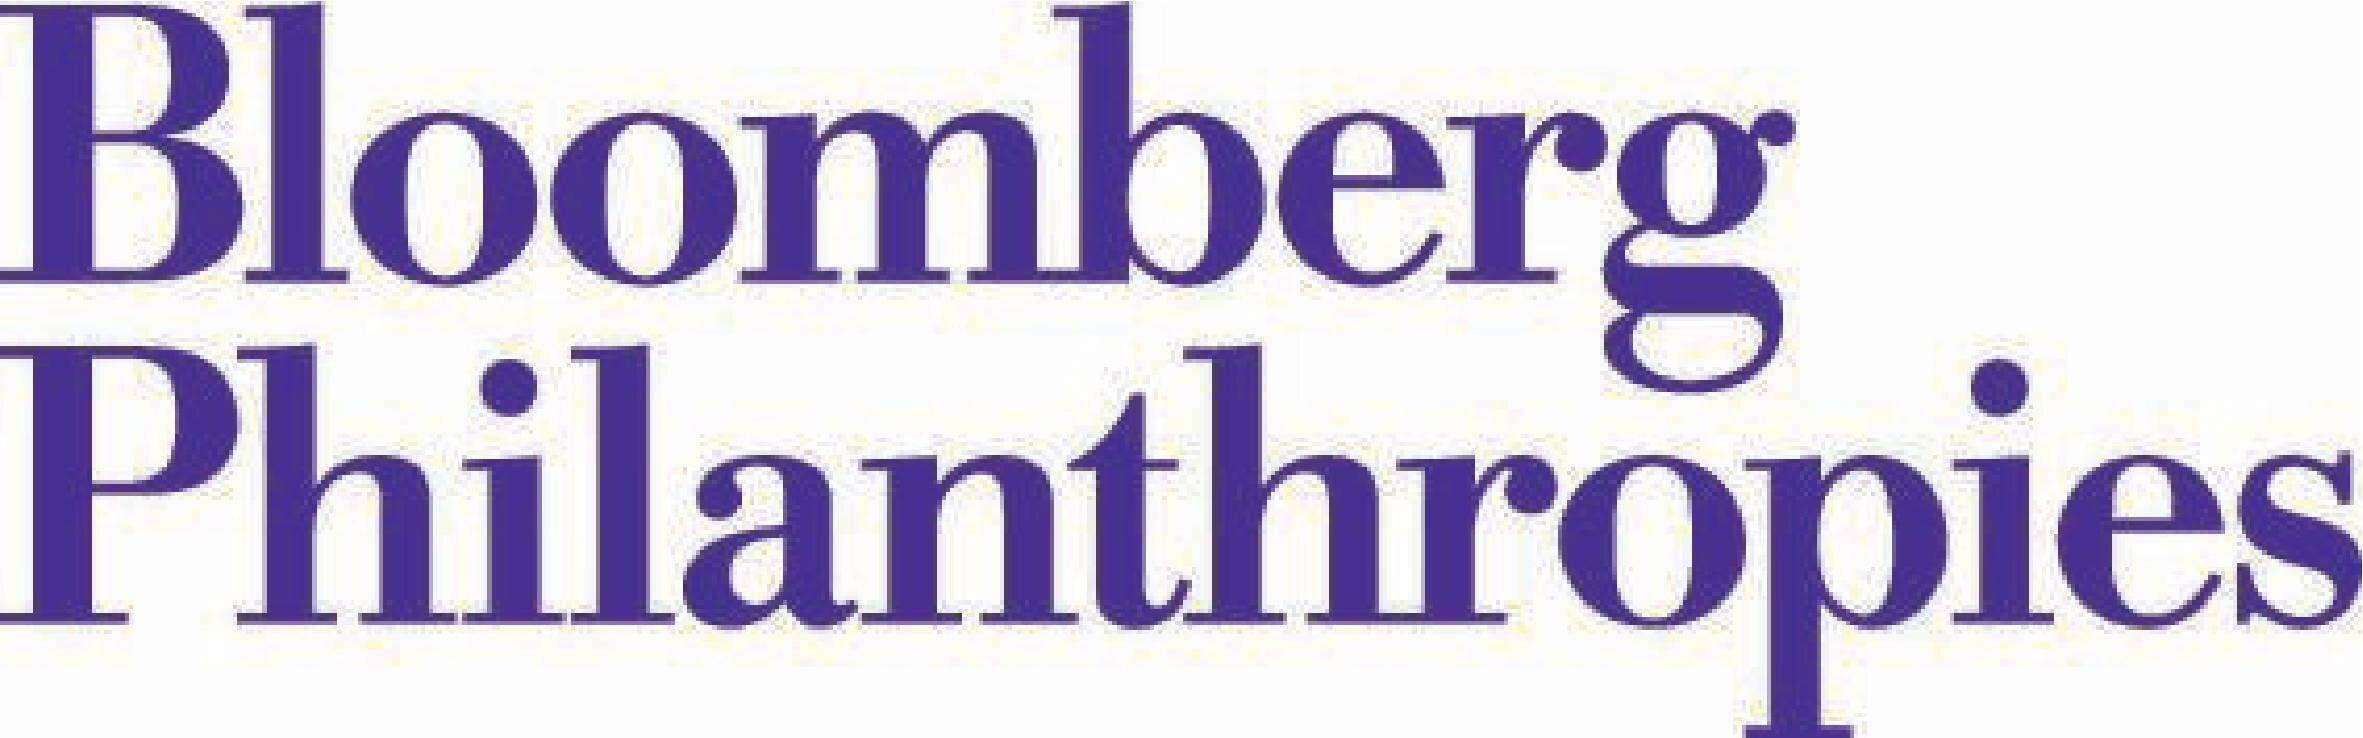 Bloomberg_logo_violetCMYK (1).jpg